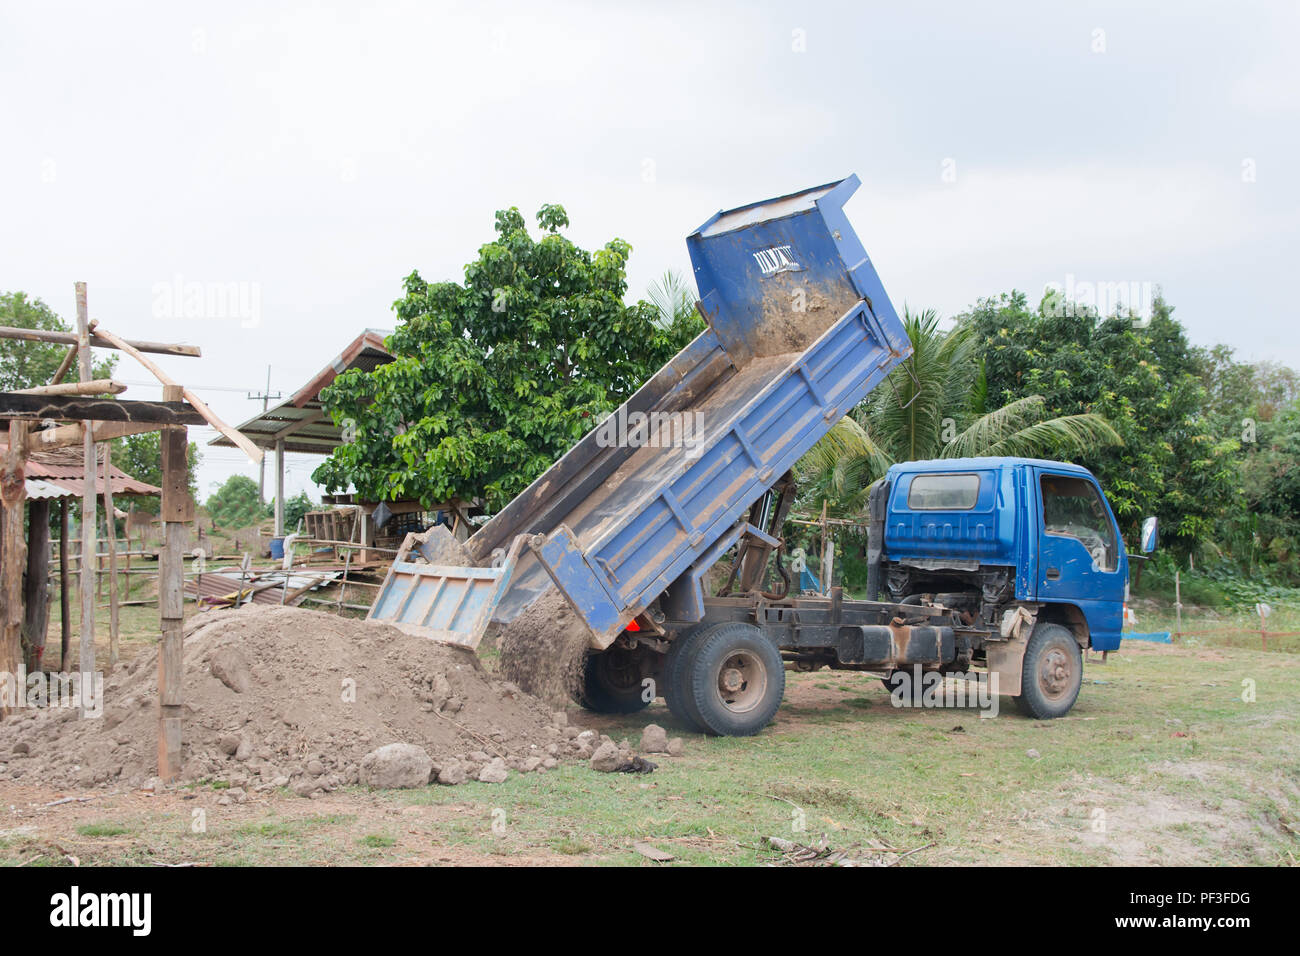 Blue dump truck unloading soil at construction site - Stock Image